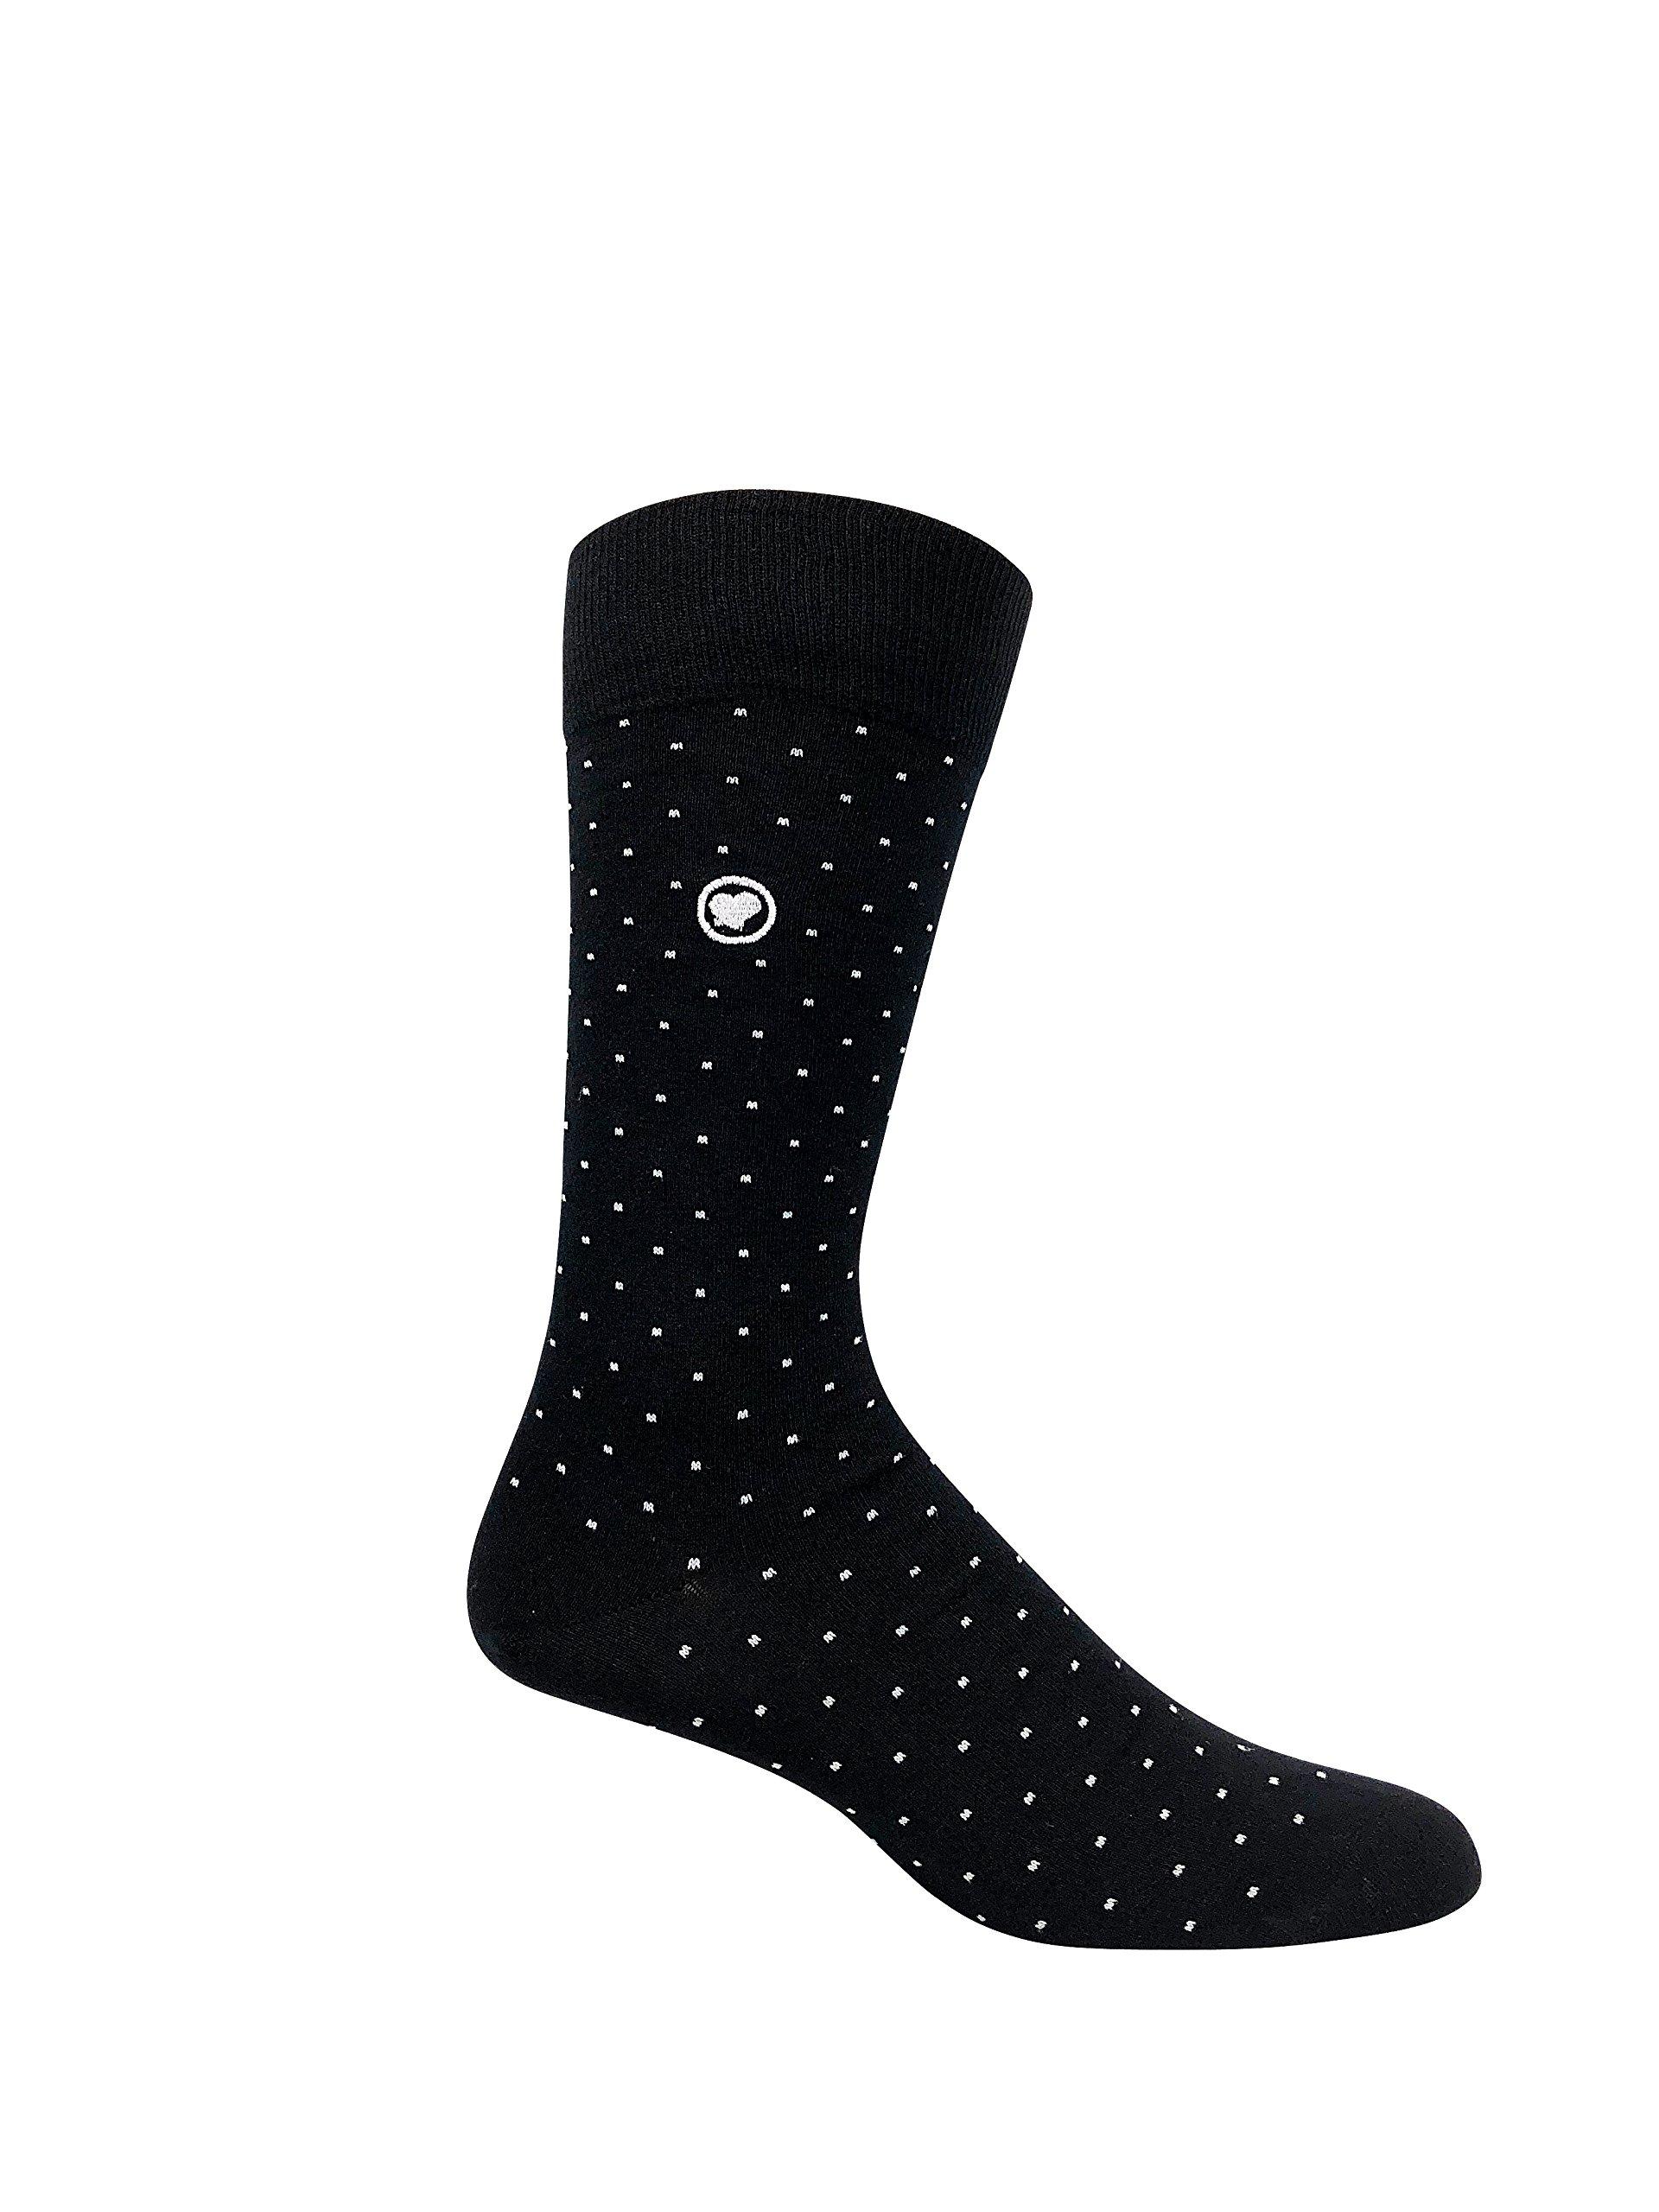 LOVE SOCK COMPANY Black Organic cotton men's dress socks bundle. 3 Premium black socks solid, polka dots and houndstooth patterned socks set by LOVE SOCK COMPANY (Image #6)